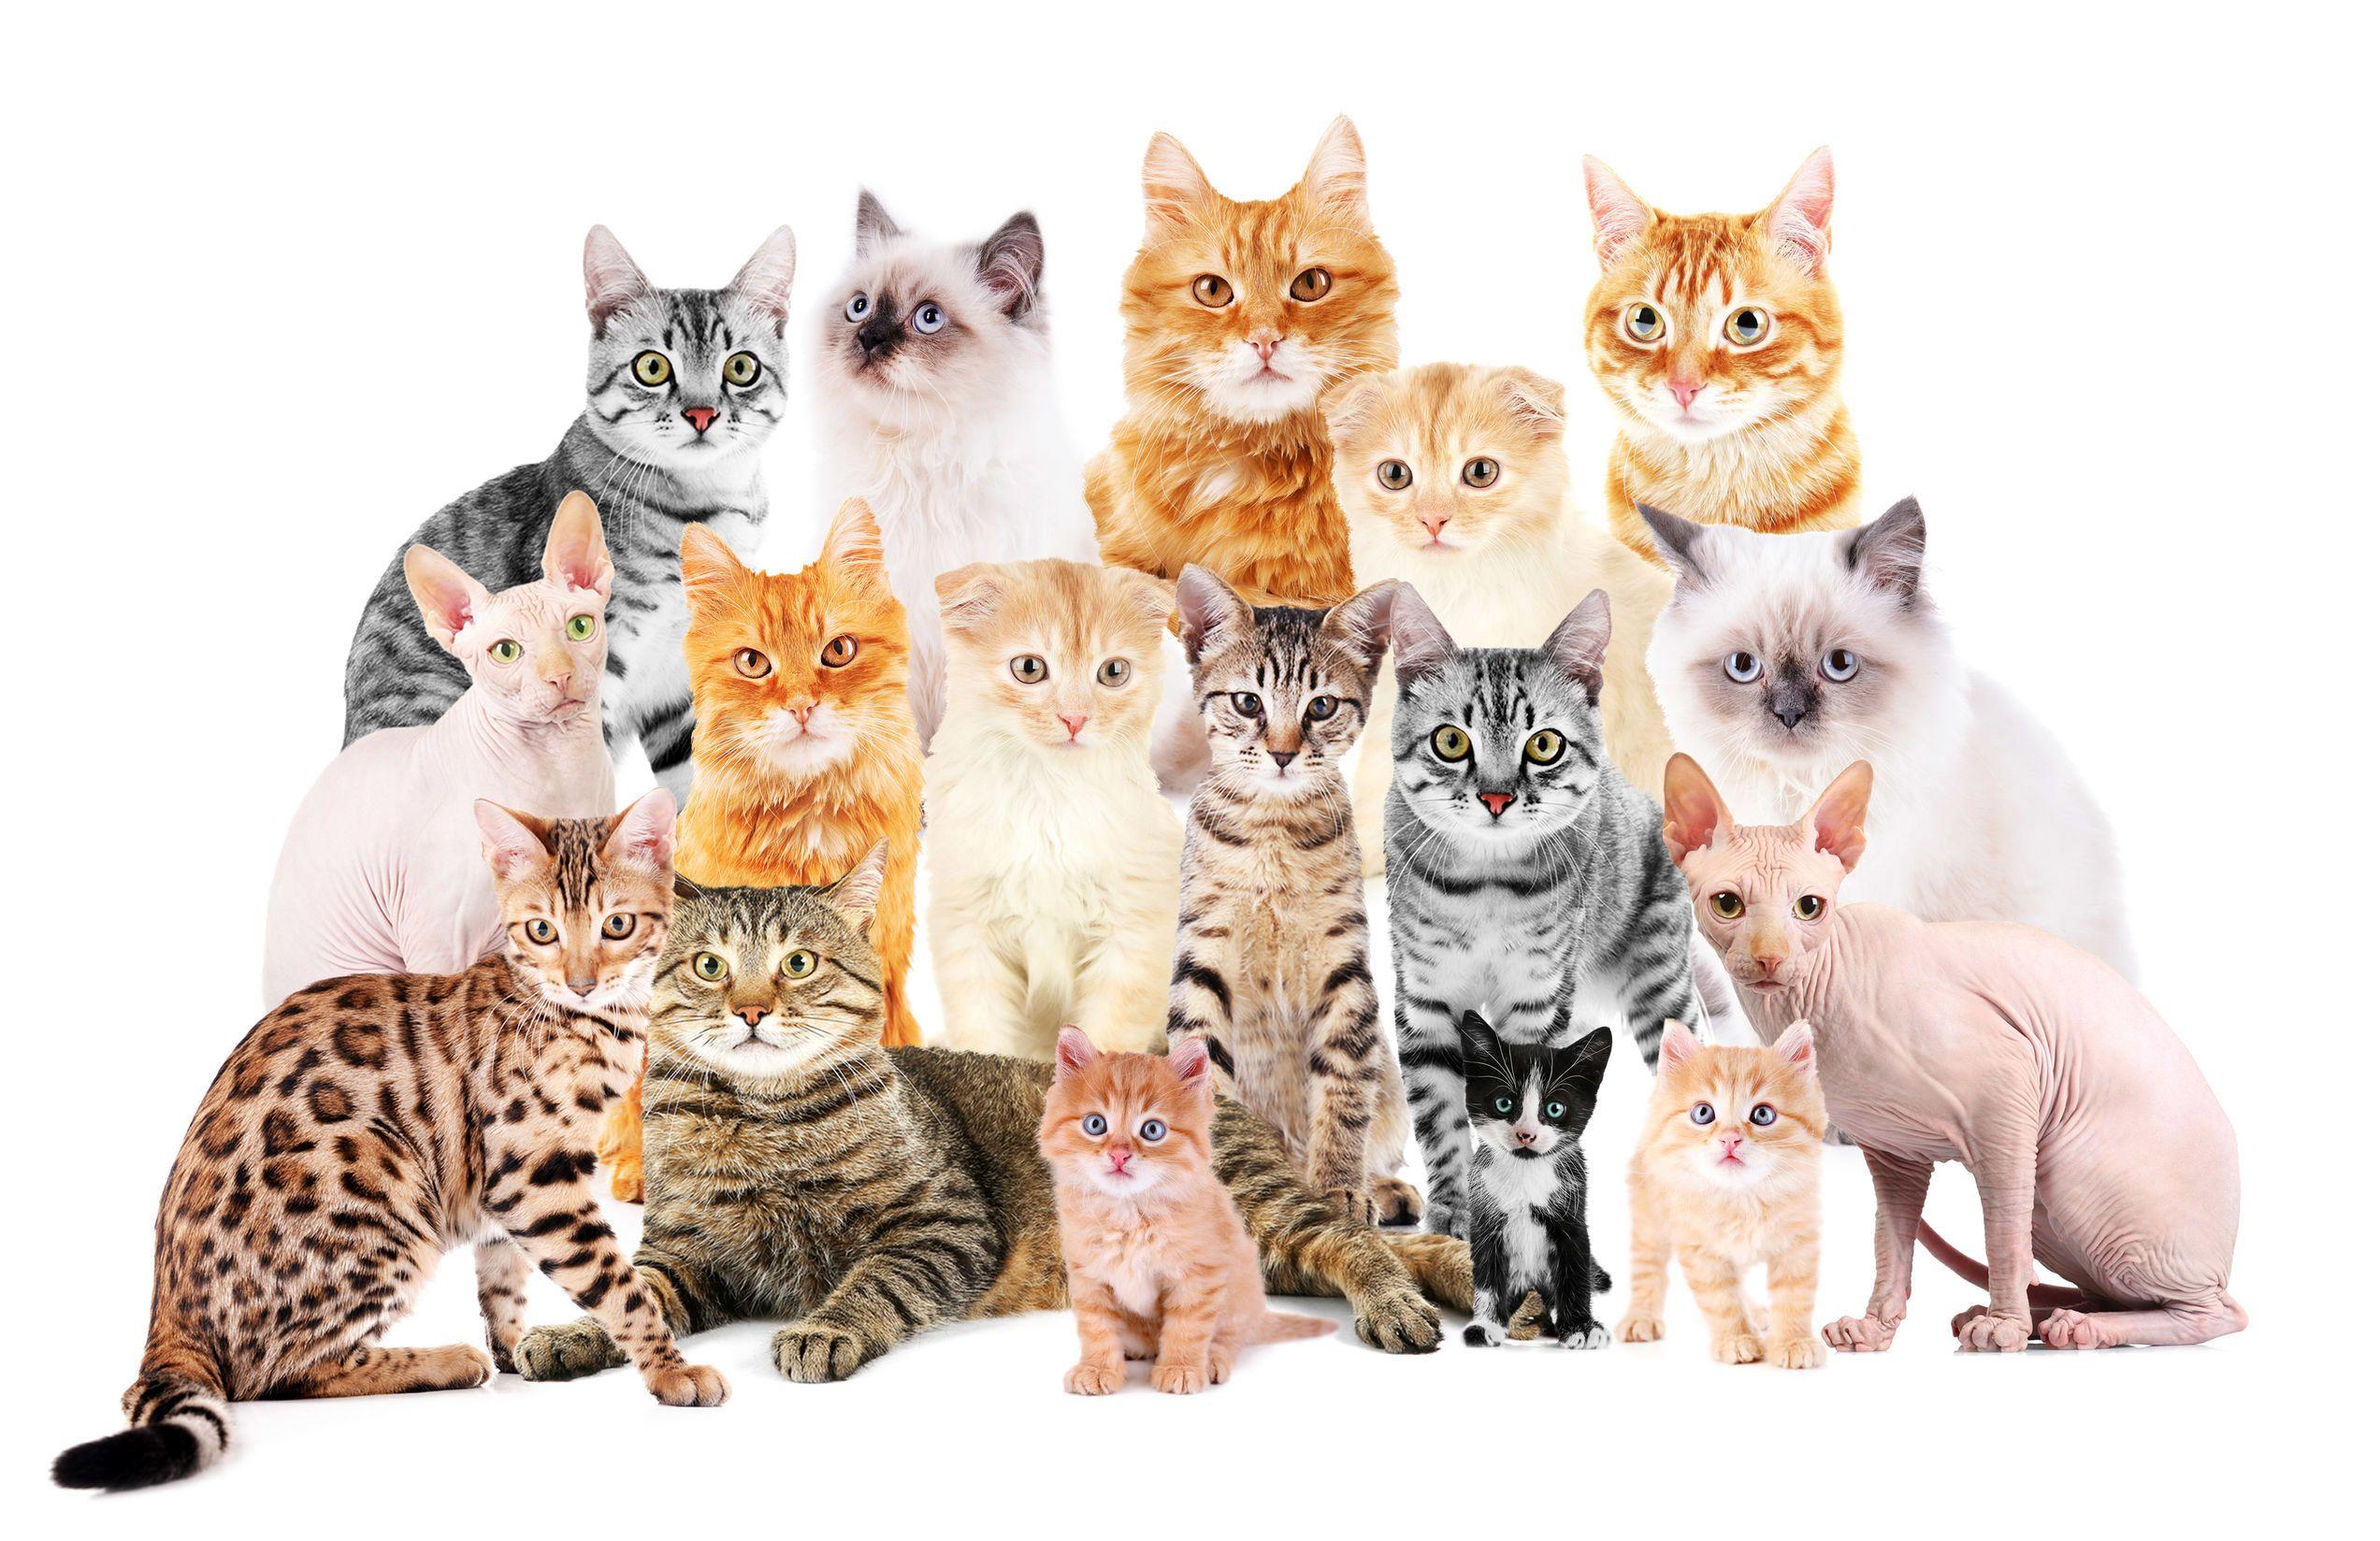 Katzen(hilfe)versammlung